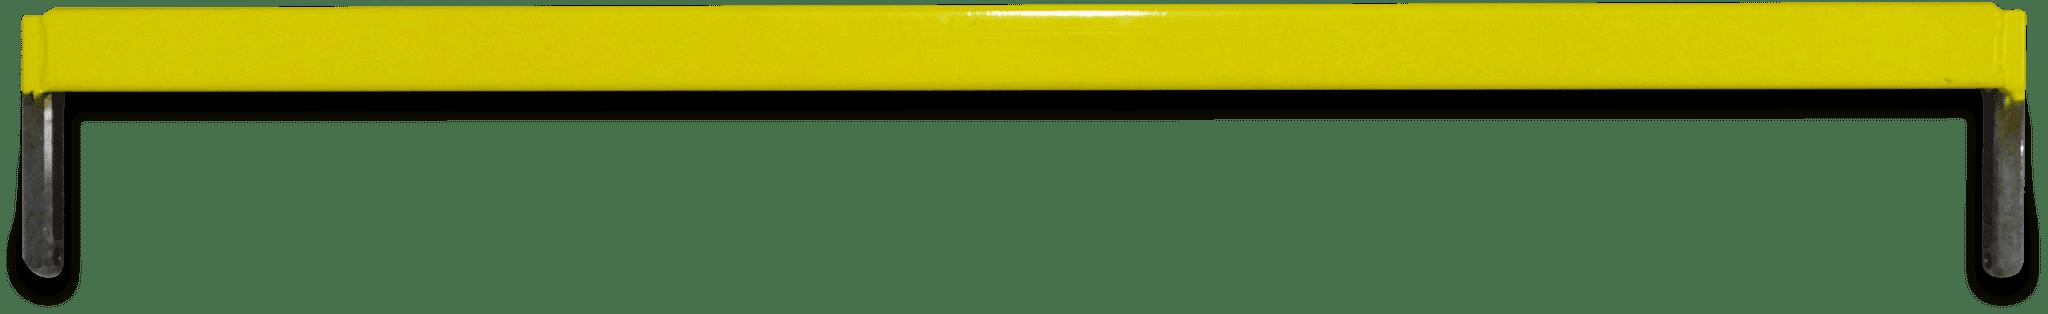 The yellow Gondola Train connecting beam.